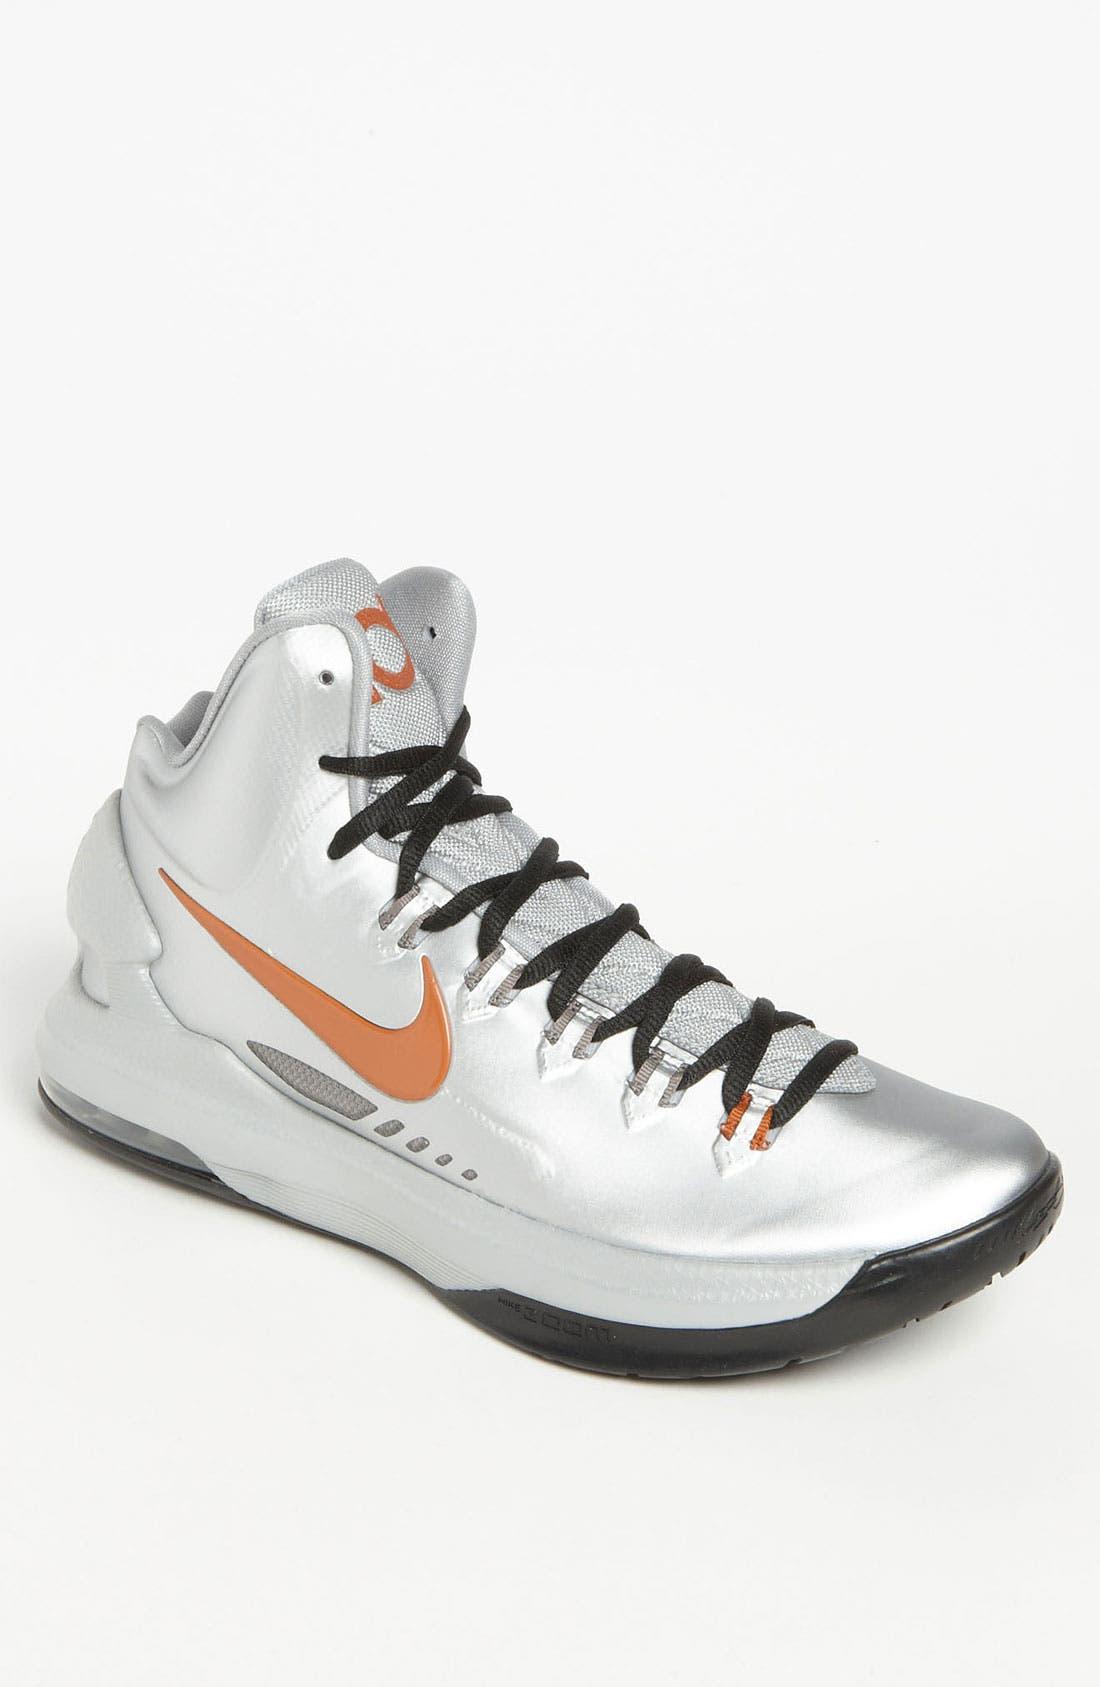 Alternate Image 1 Selected - Nike 'KD V' Basketball Shoe (Men)